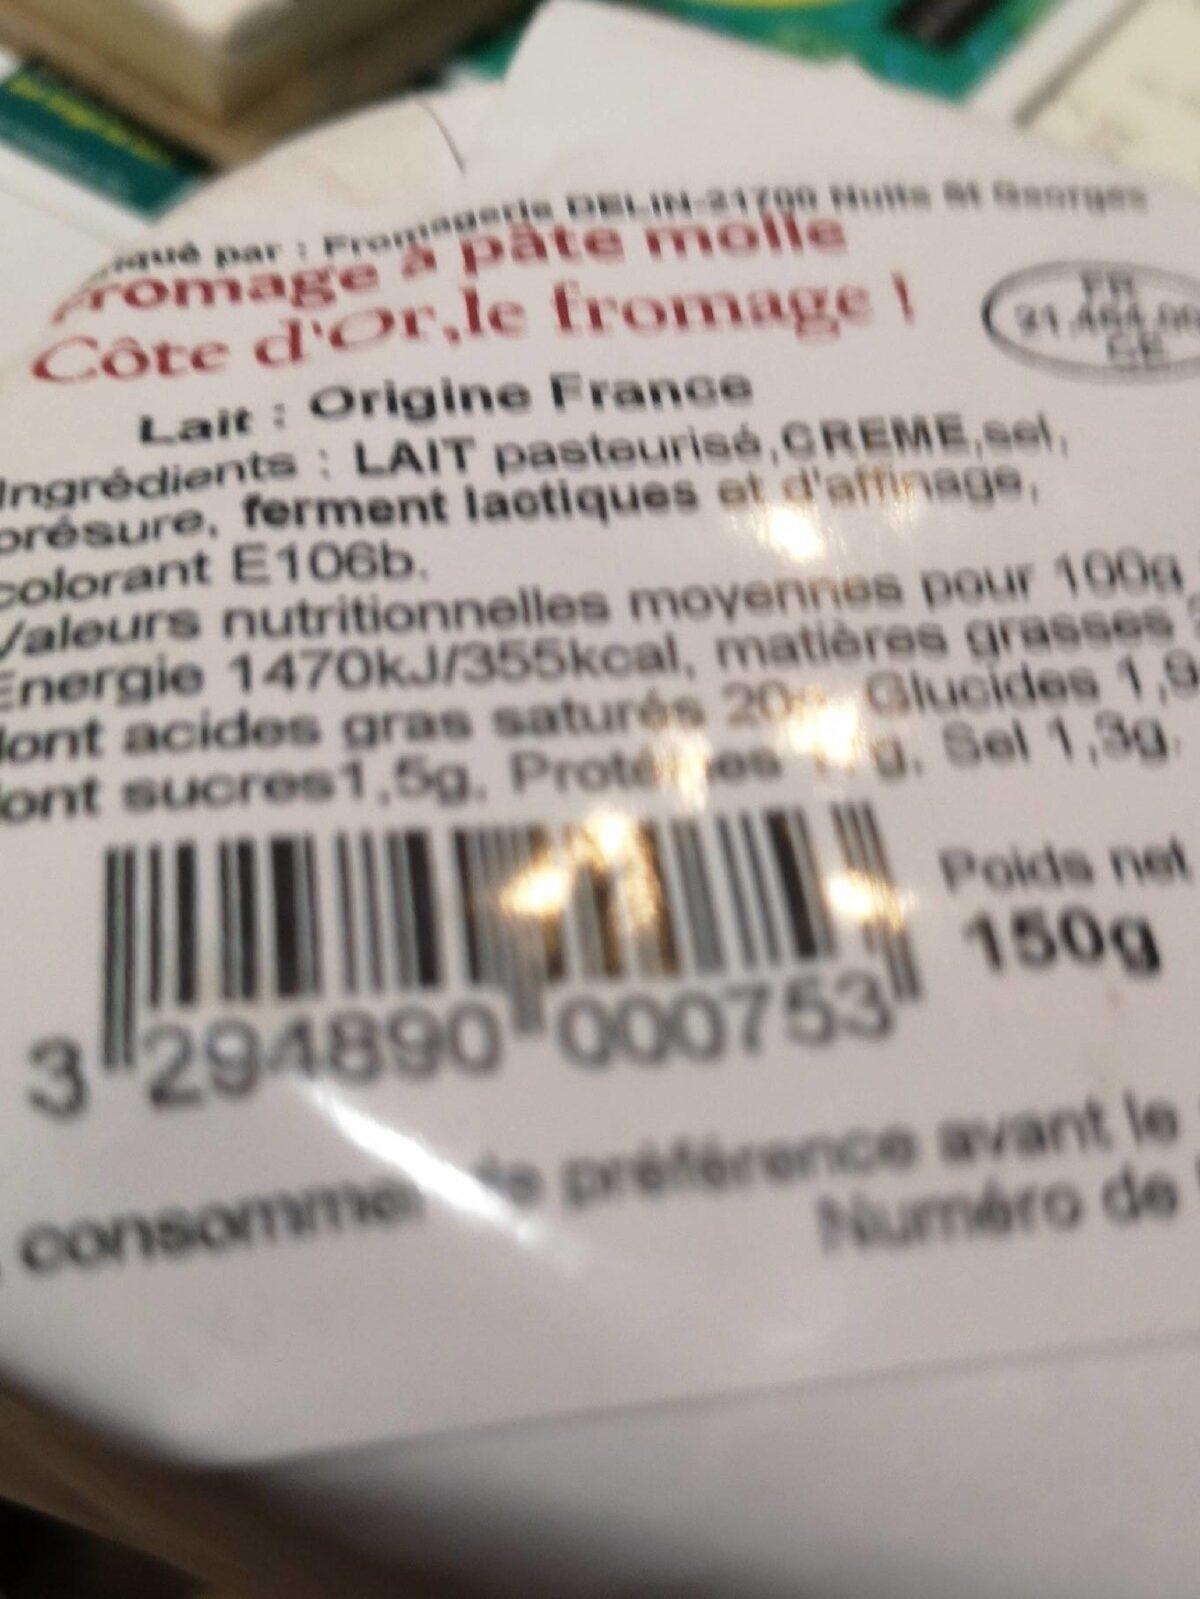 Cote d'or fromage à pâte molle - Ingredients - fr